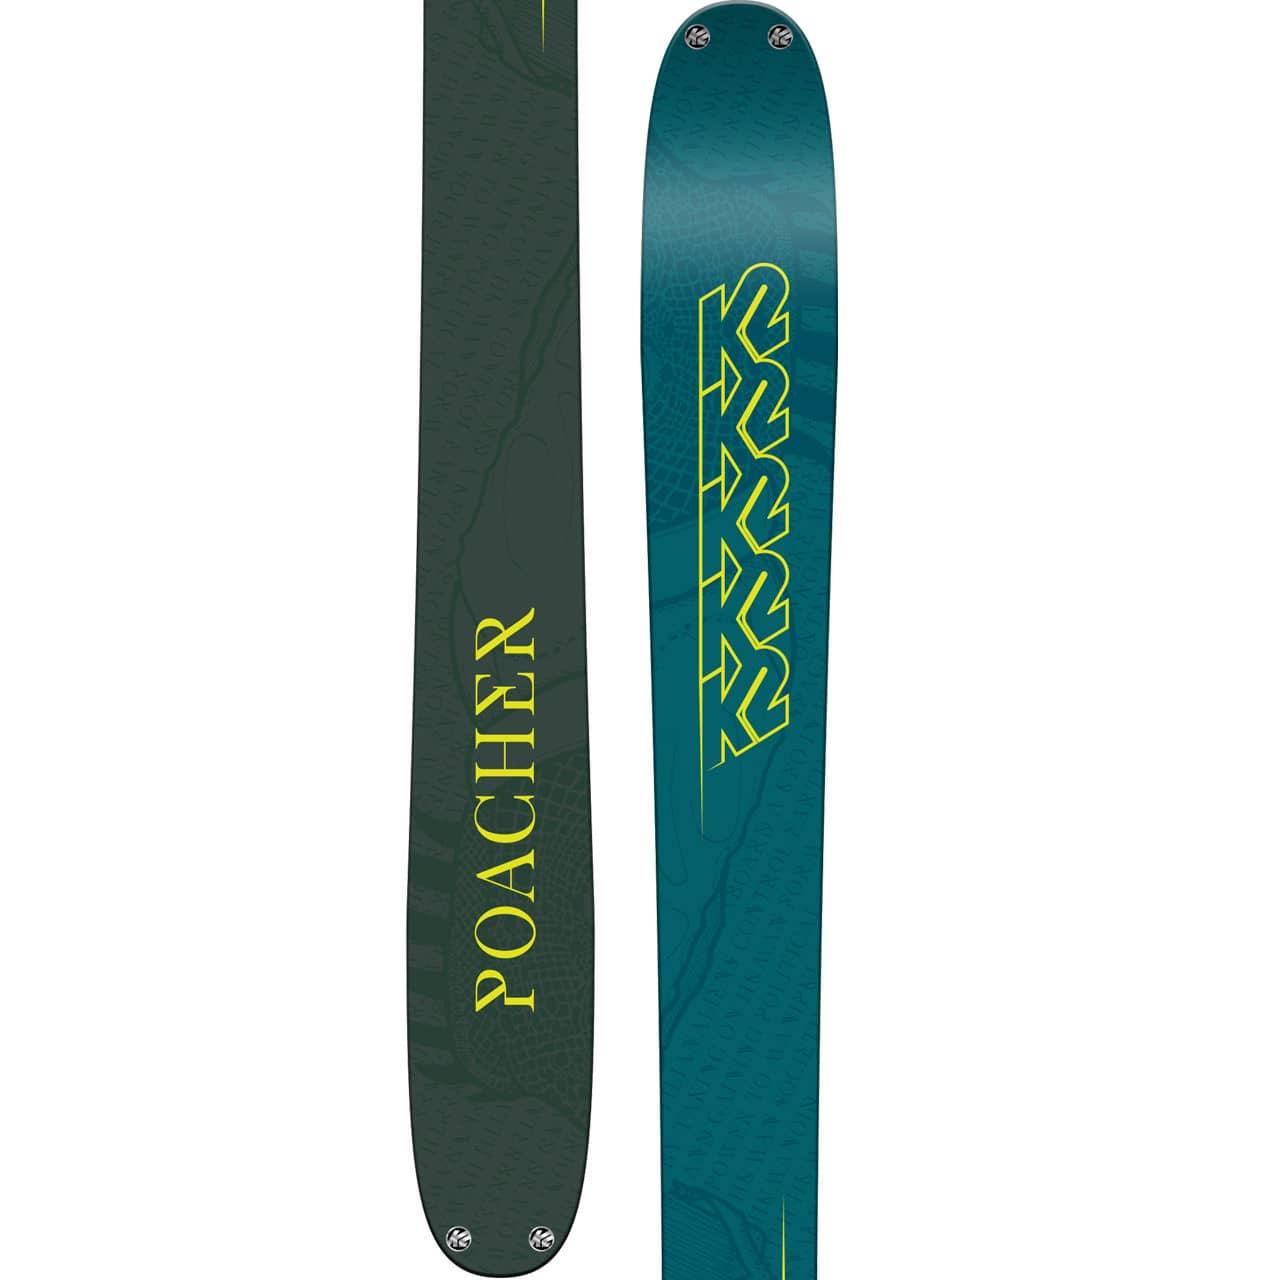 Marker Squire 11 ID Freeride-Bindung Skisport & Snowboarding black